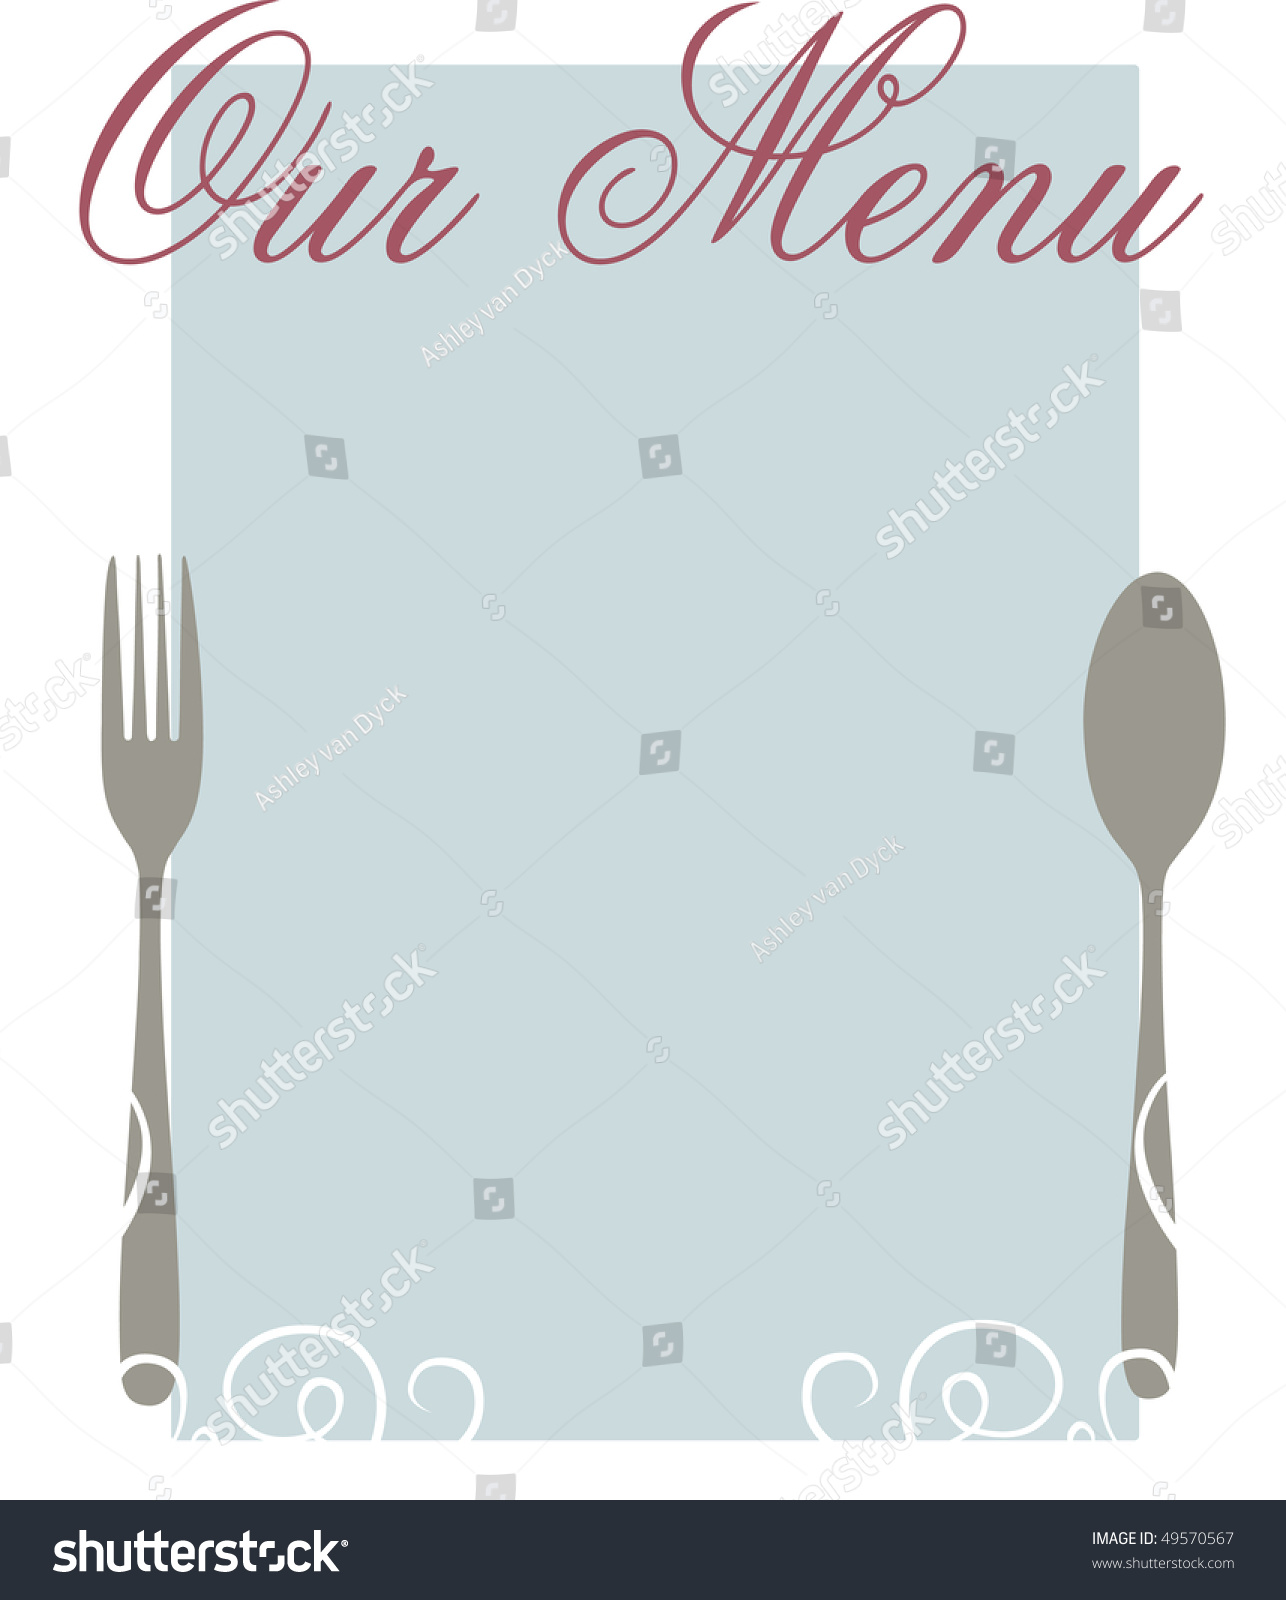 elegant blank menu template stock illustration 49570567 - shutterstock